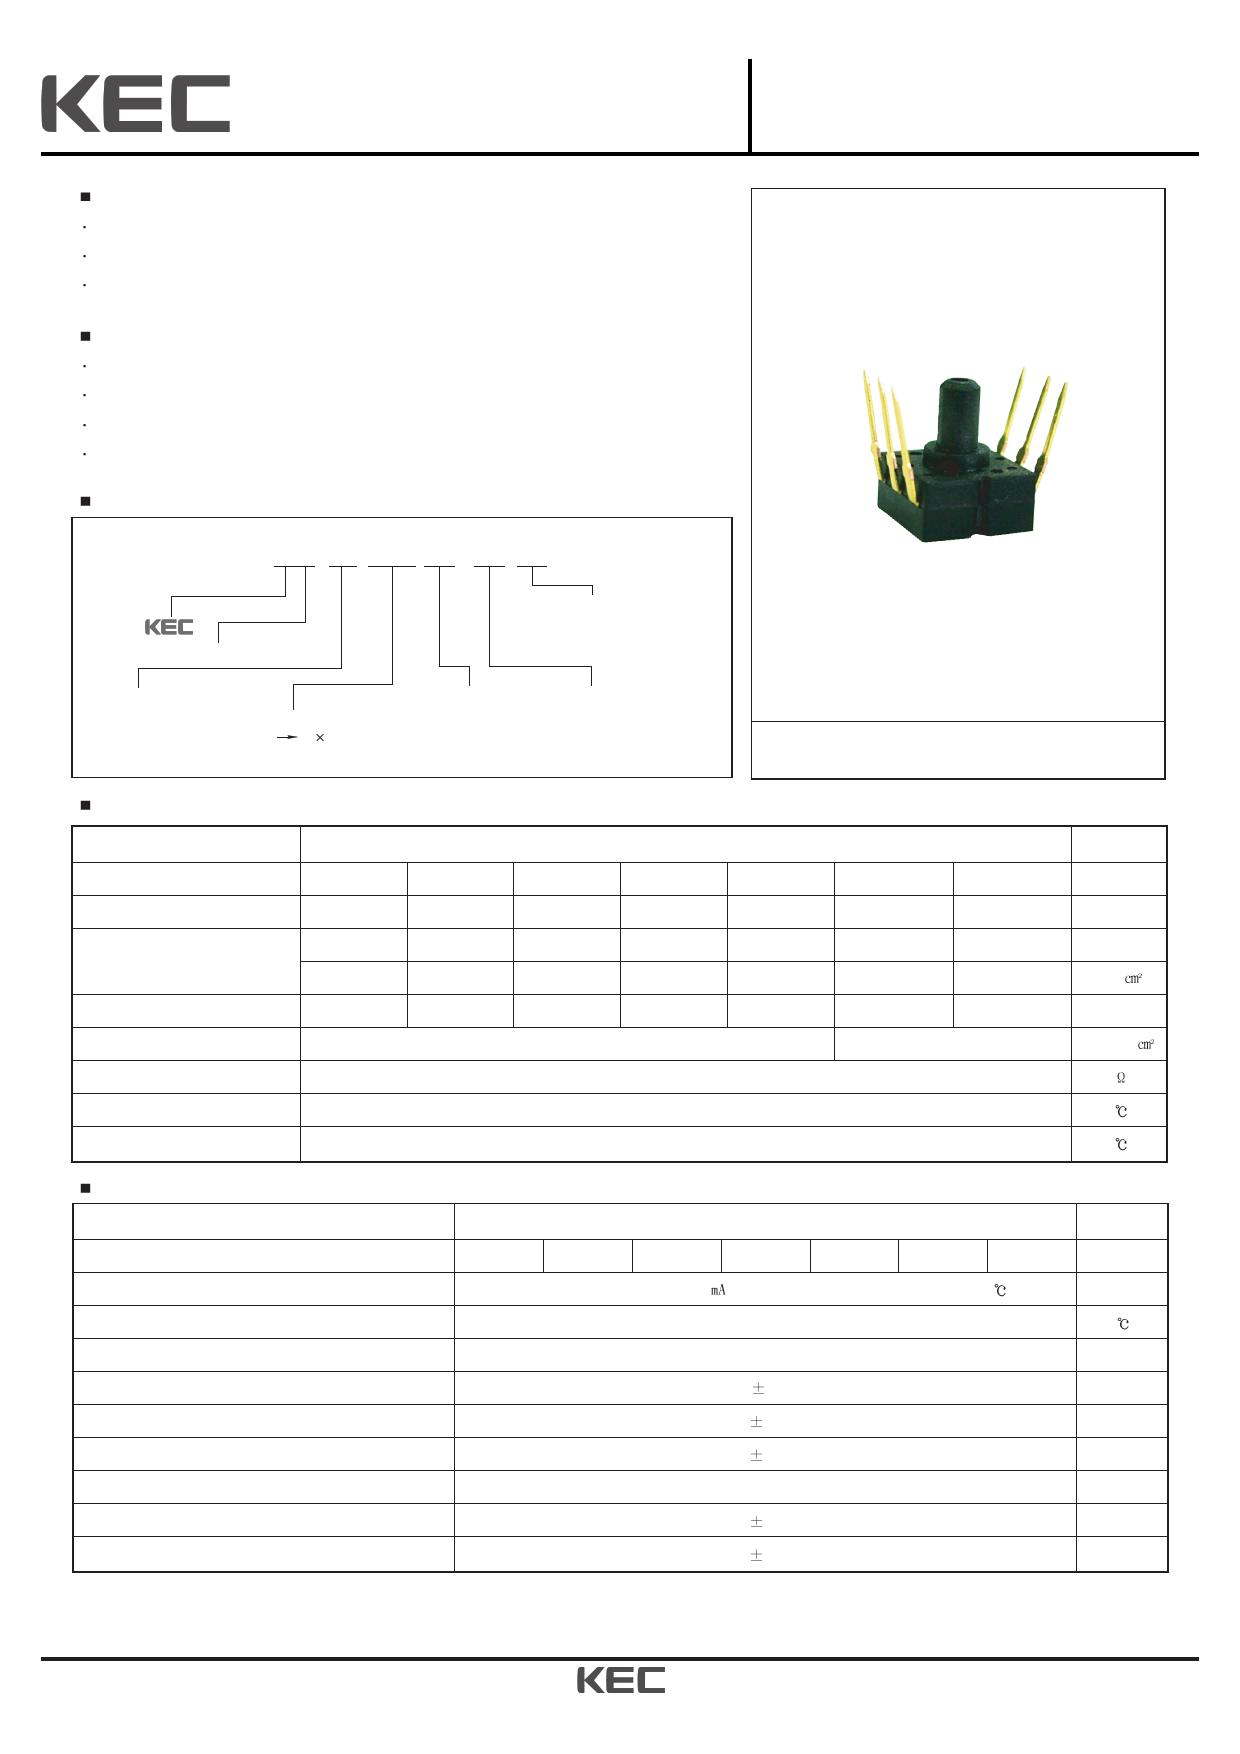 KPF801G02 데이터시트 및 KPF801G02 PDF